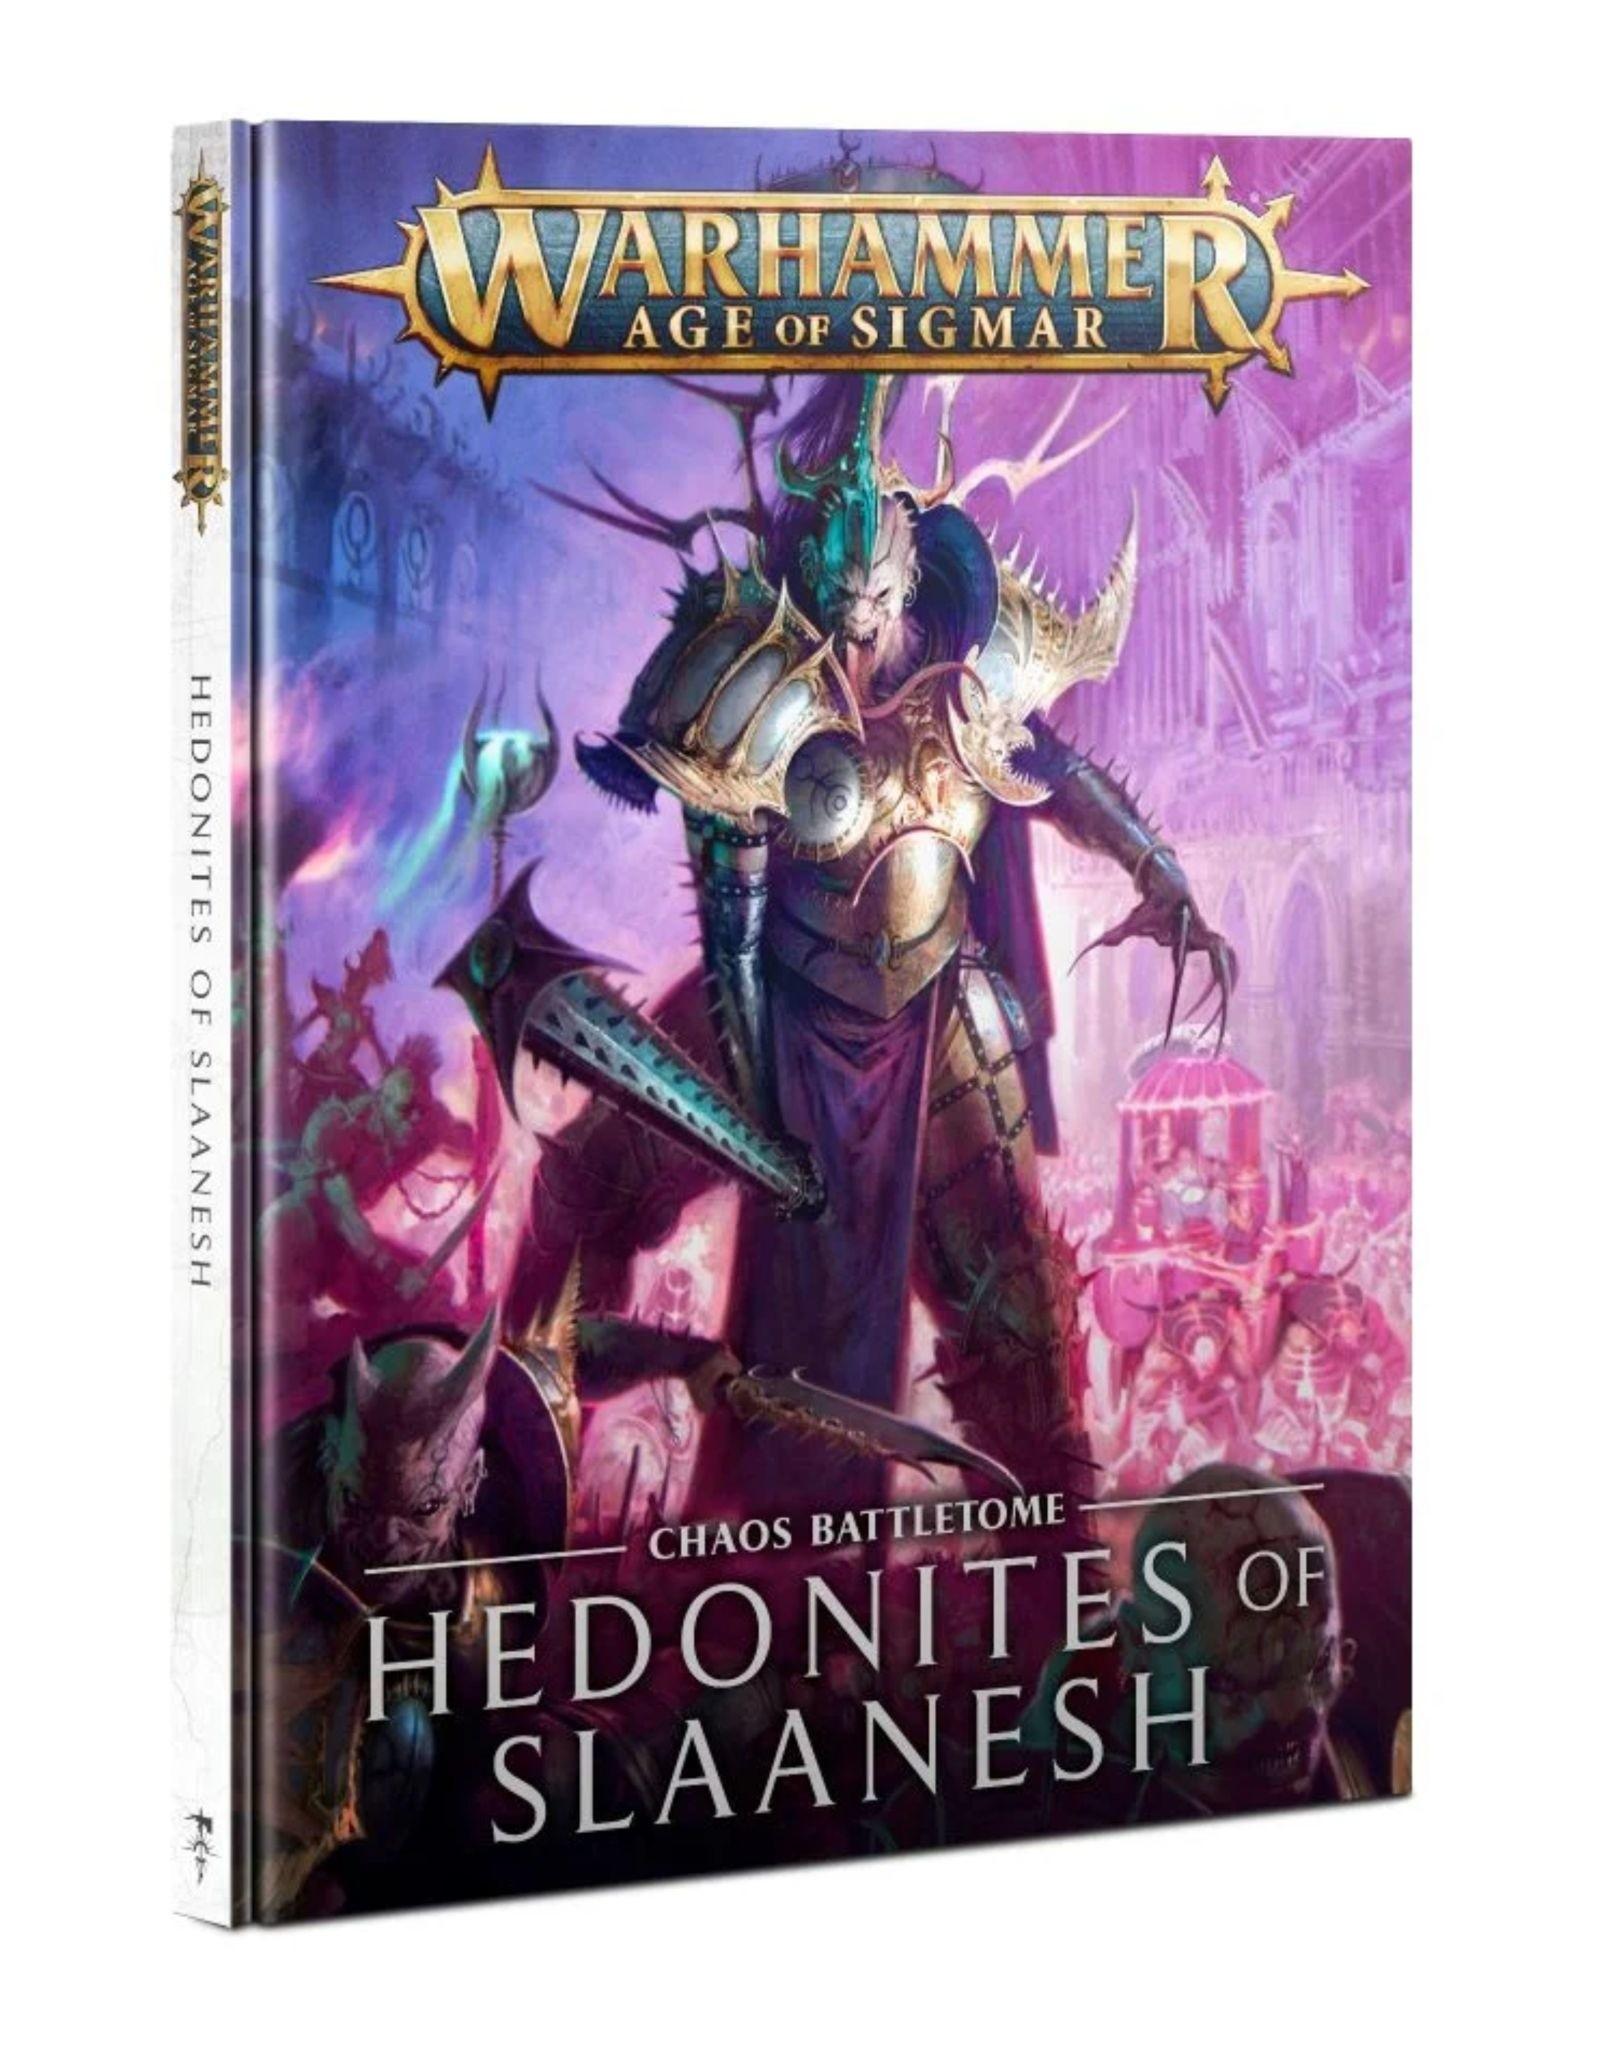 Age of Sigmar Battletome: Hedonites of Slaanesh (2021)